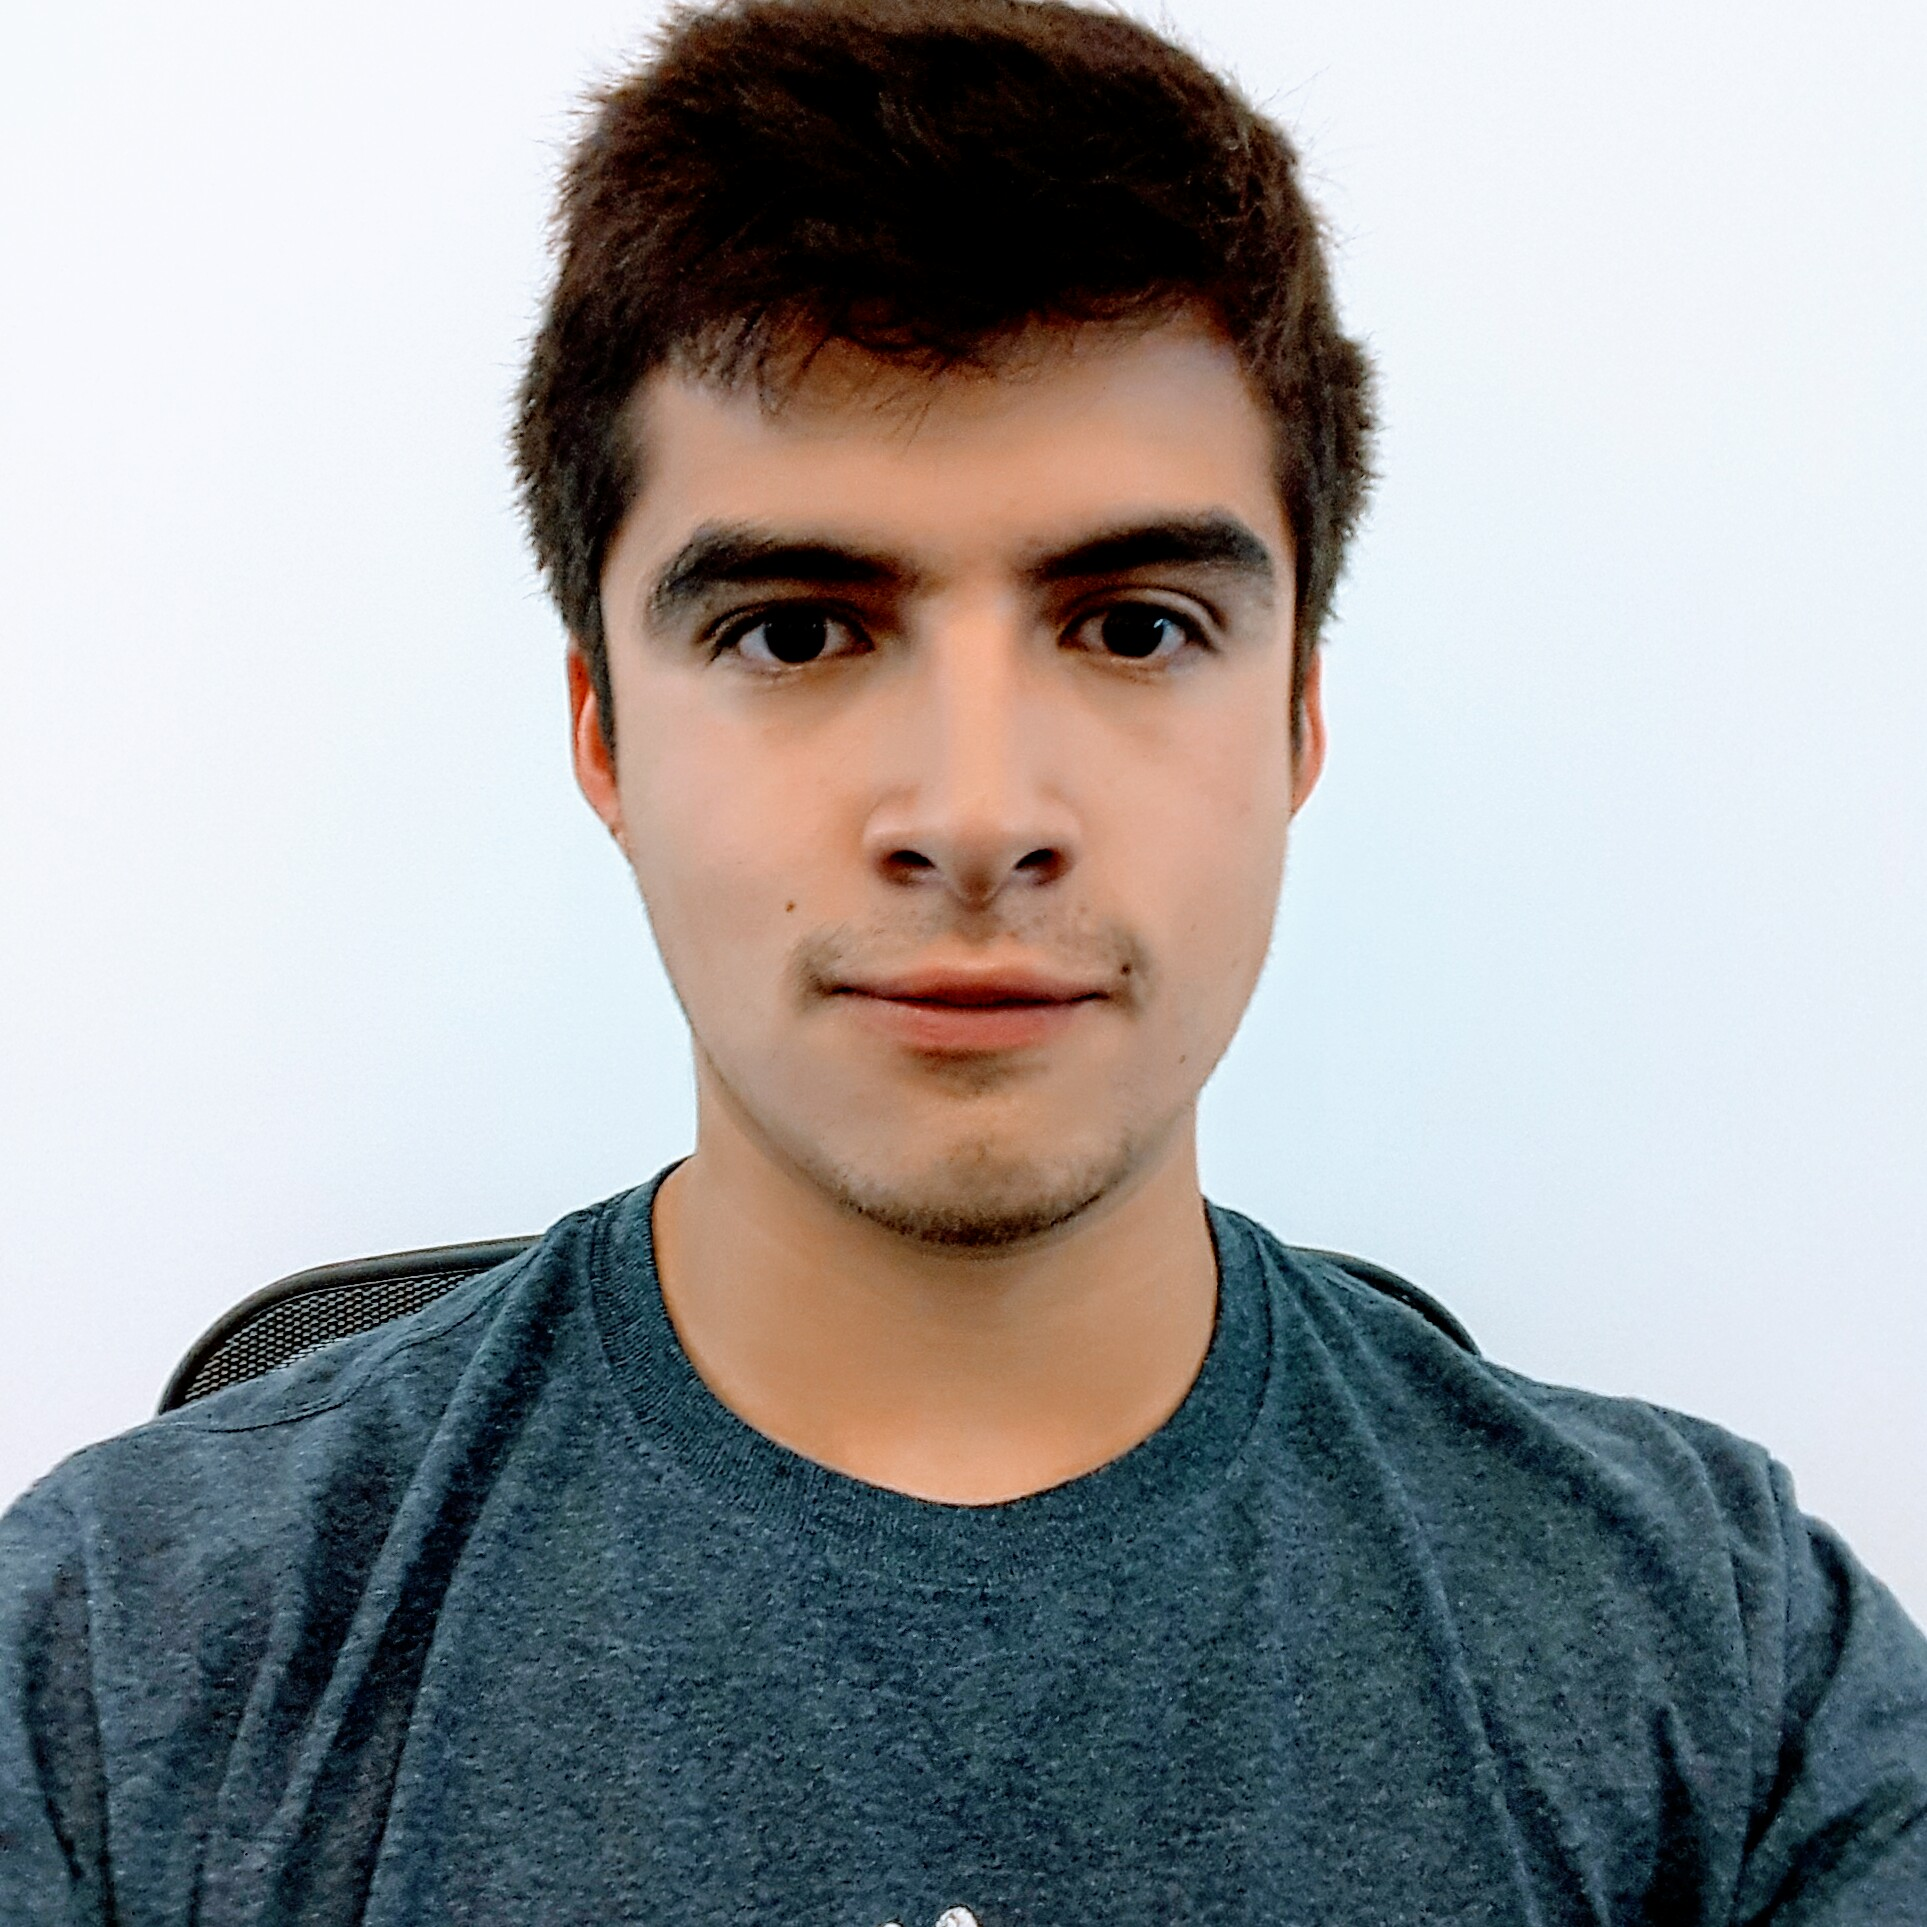 Rafael Zamora-Resendiz